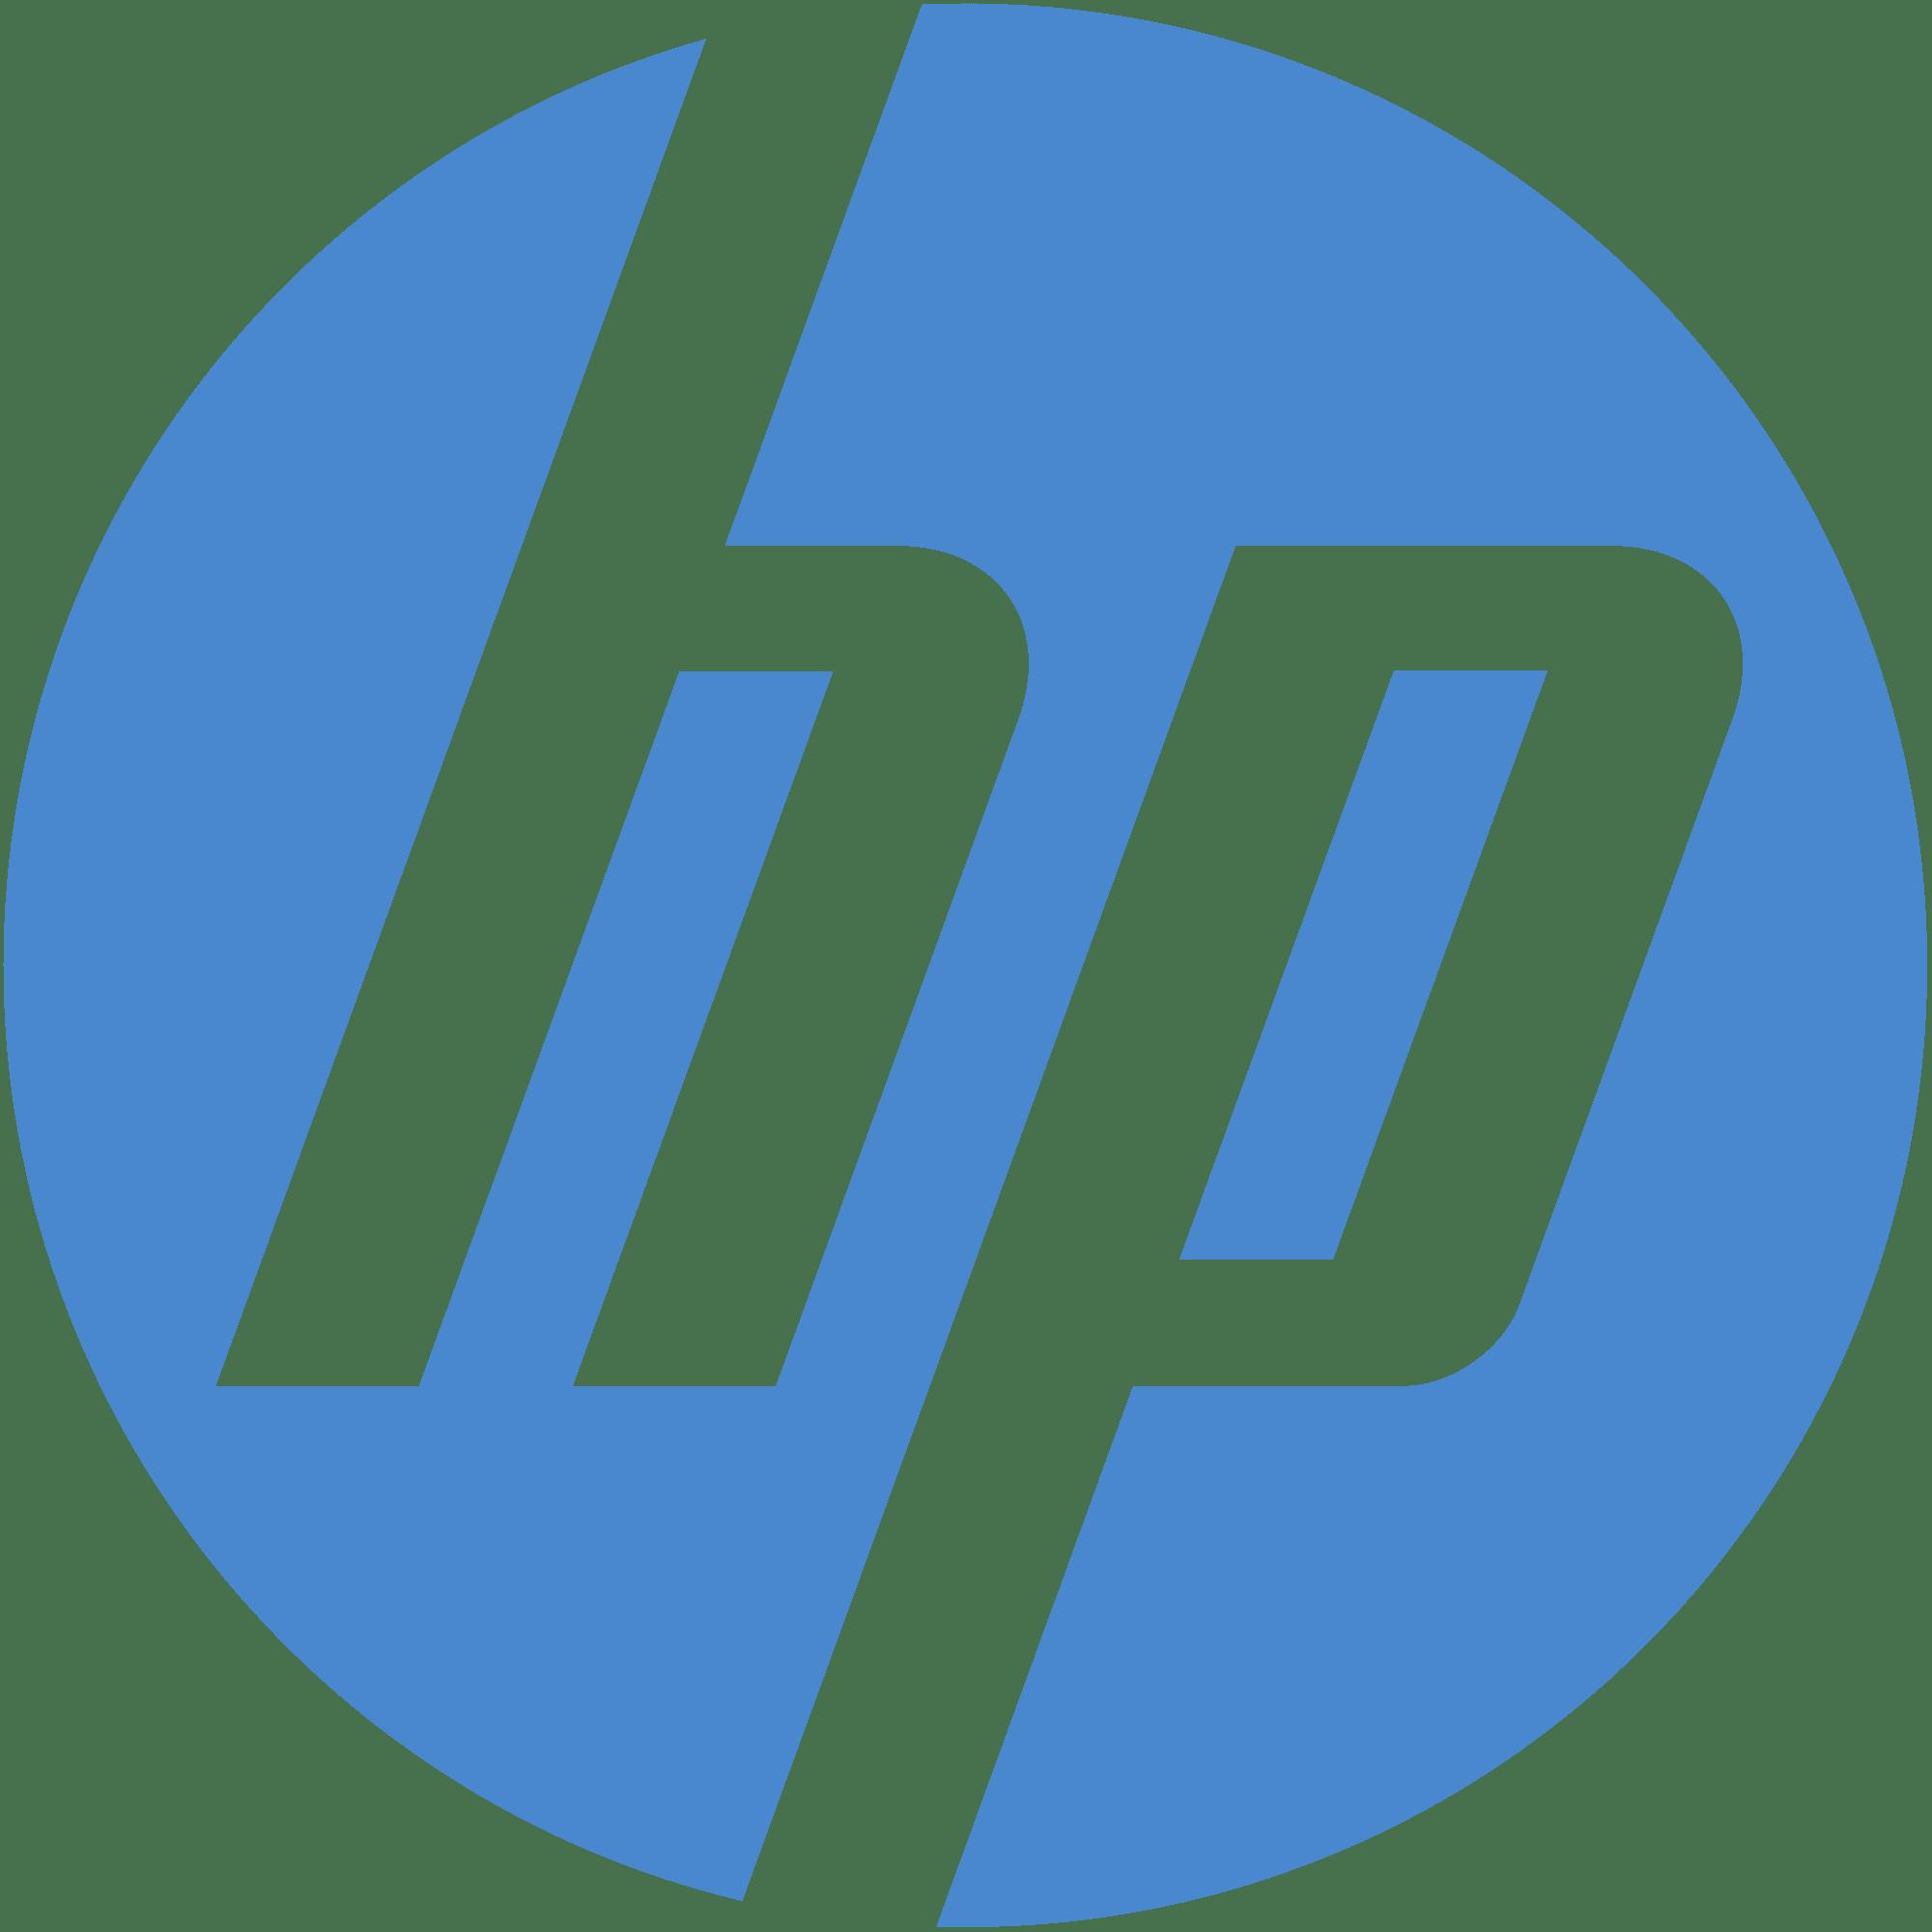 HP t510 Flexible Thin Client drivers